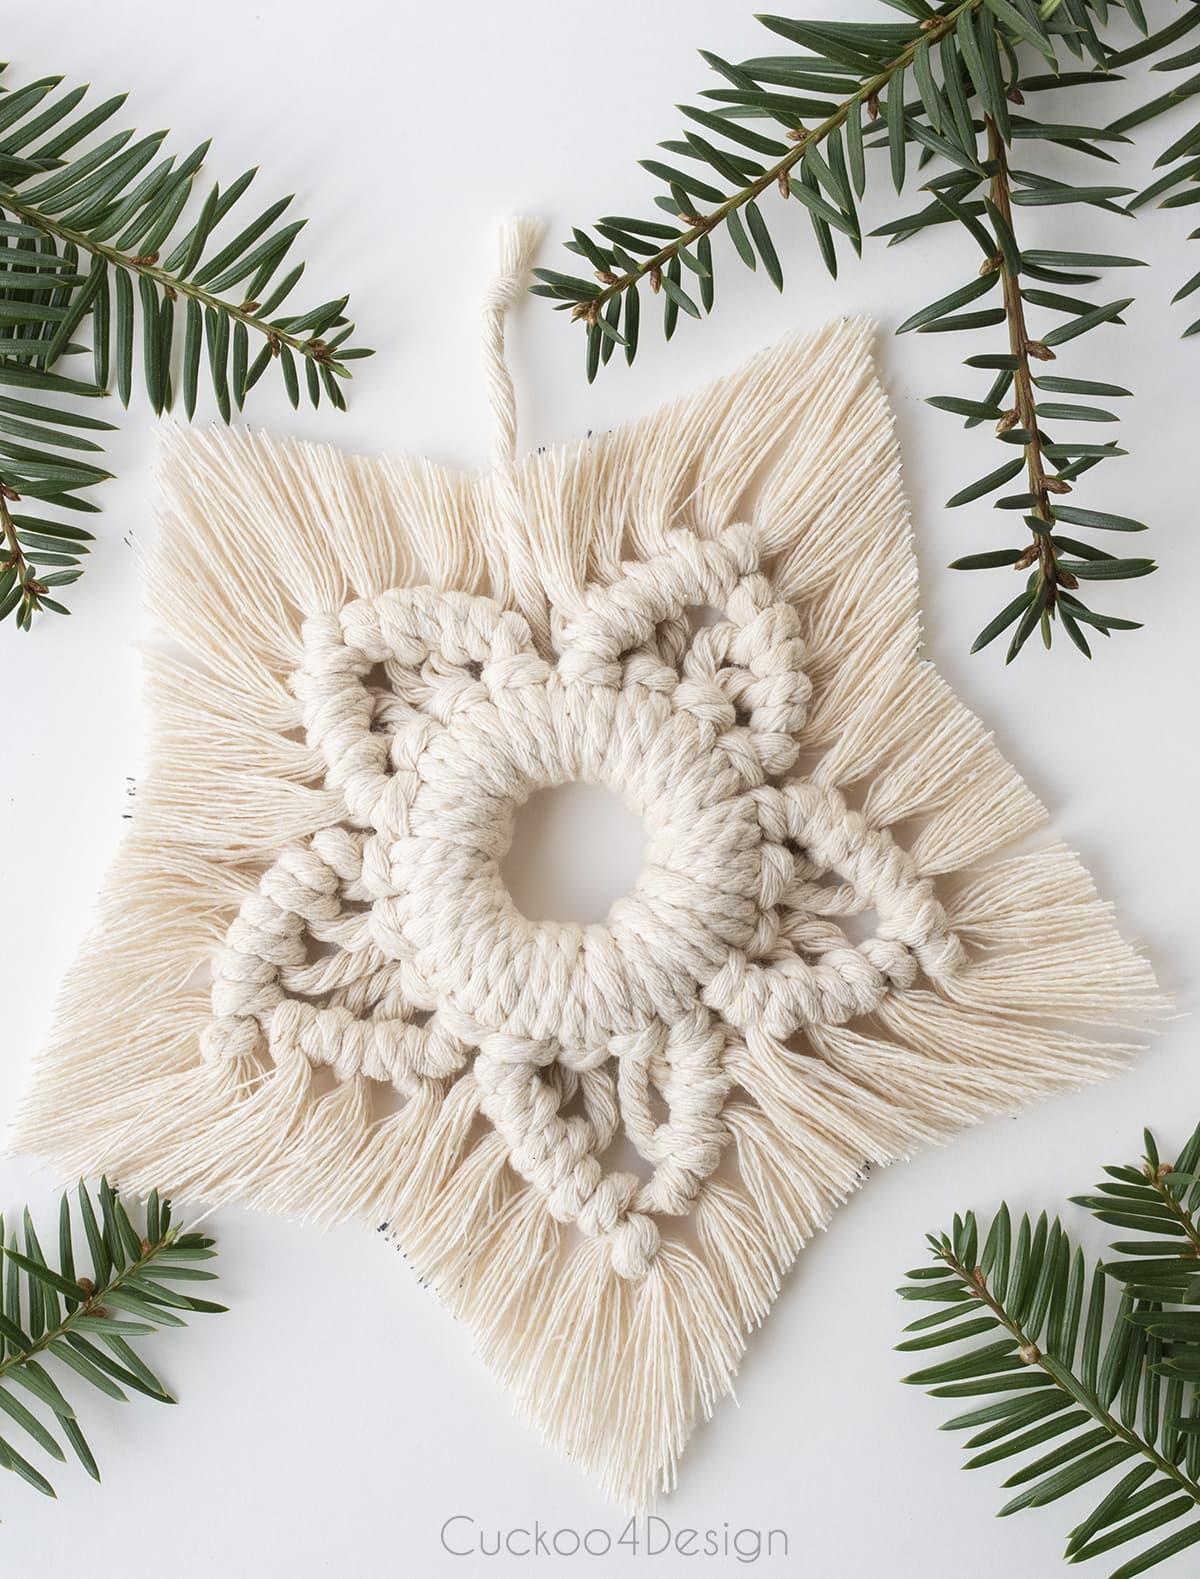 hoe to make a macrame snowflake Christmas ornament